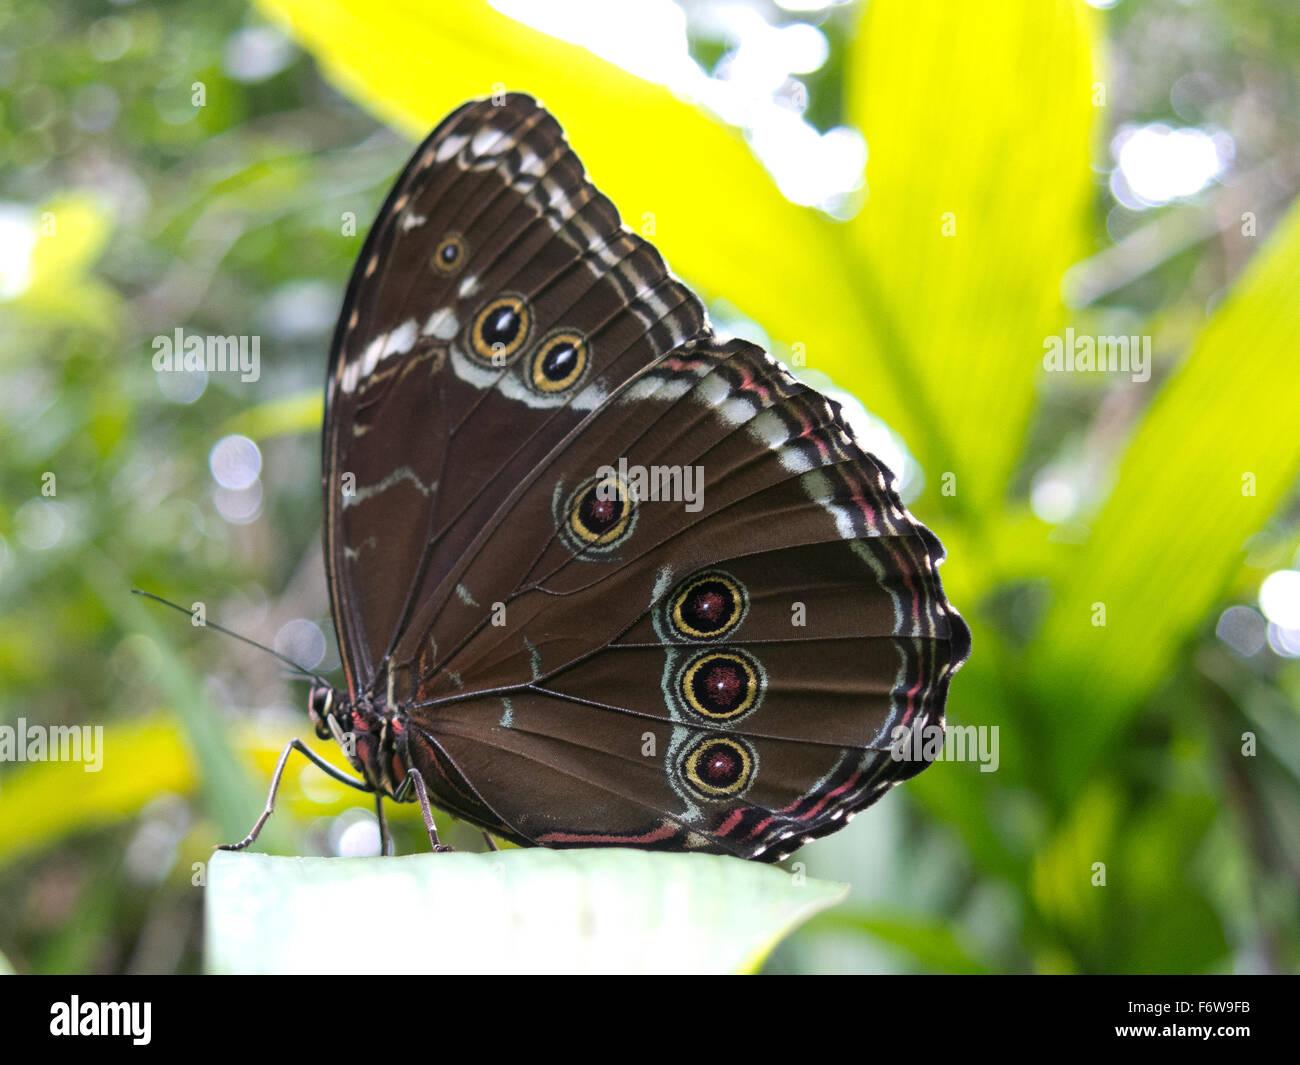 Owl butterfly, Caligo sp., in Amazon rainforest. Madidi Park, La Paz Region. Bolivia. - Stock Image